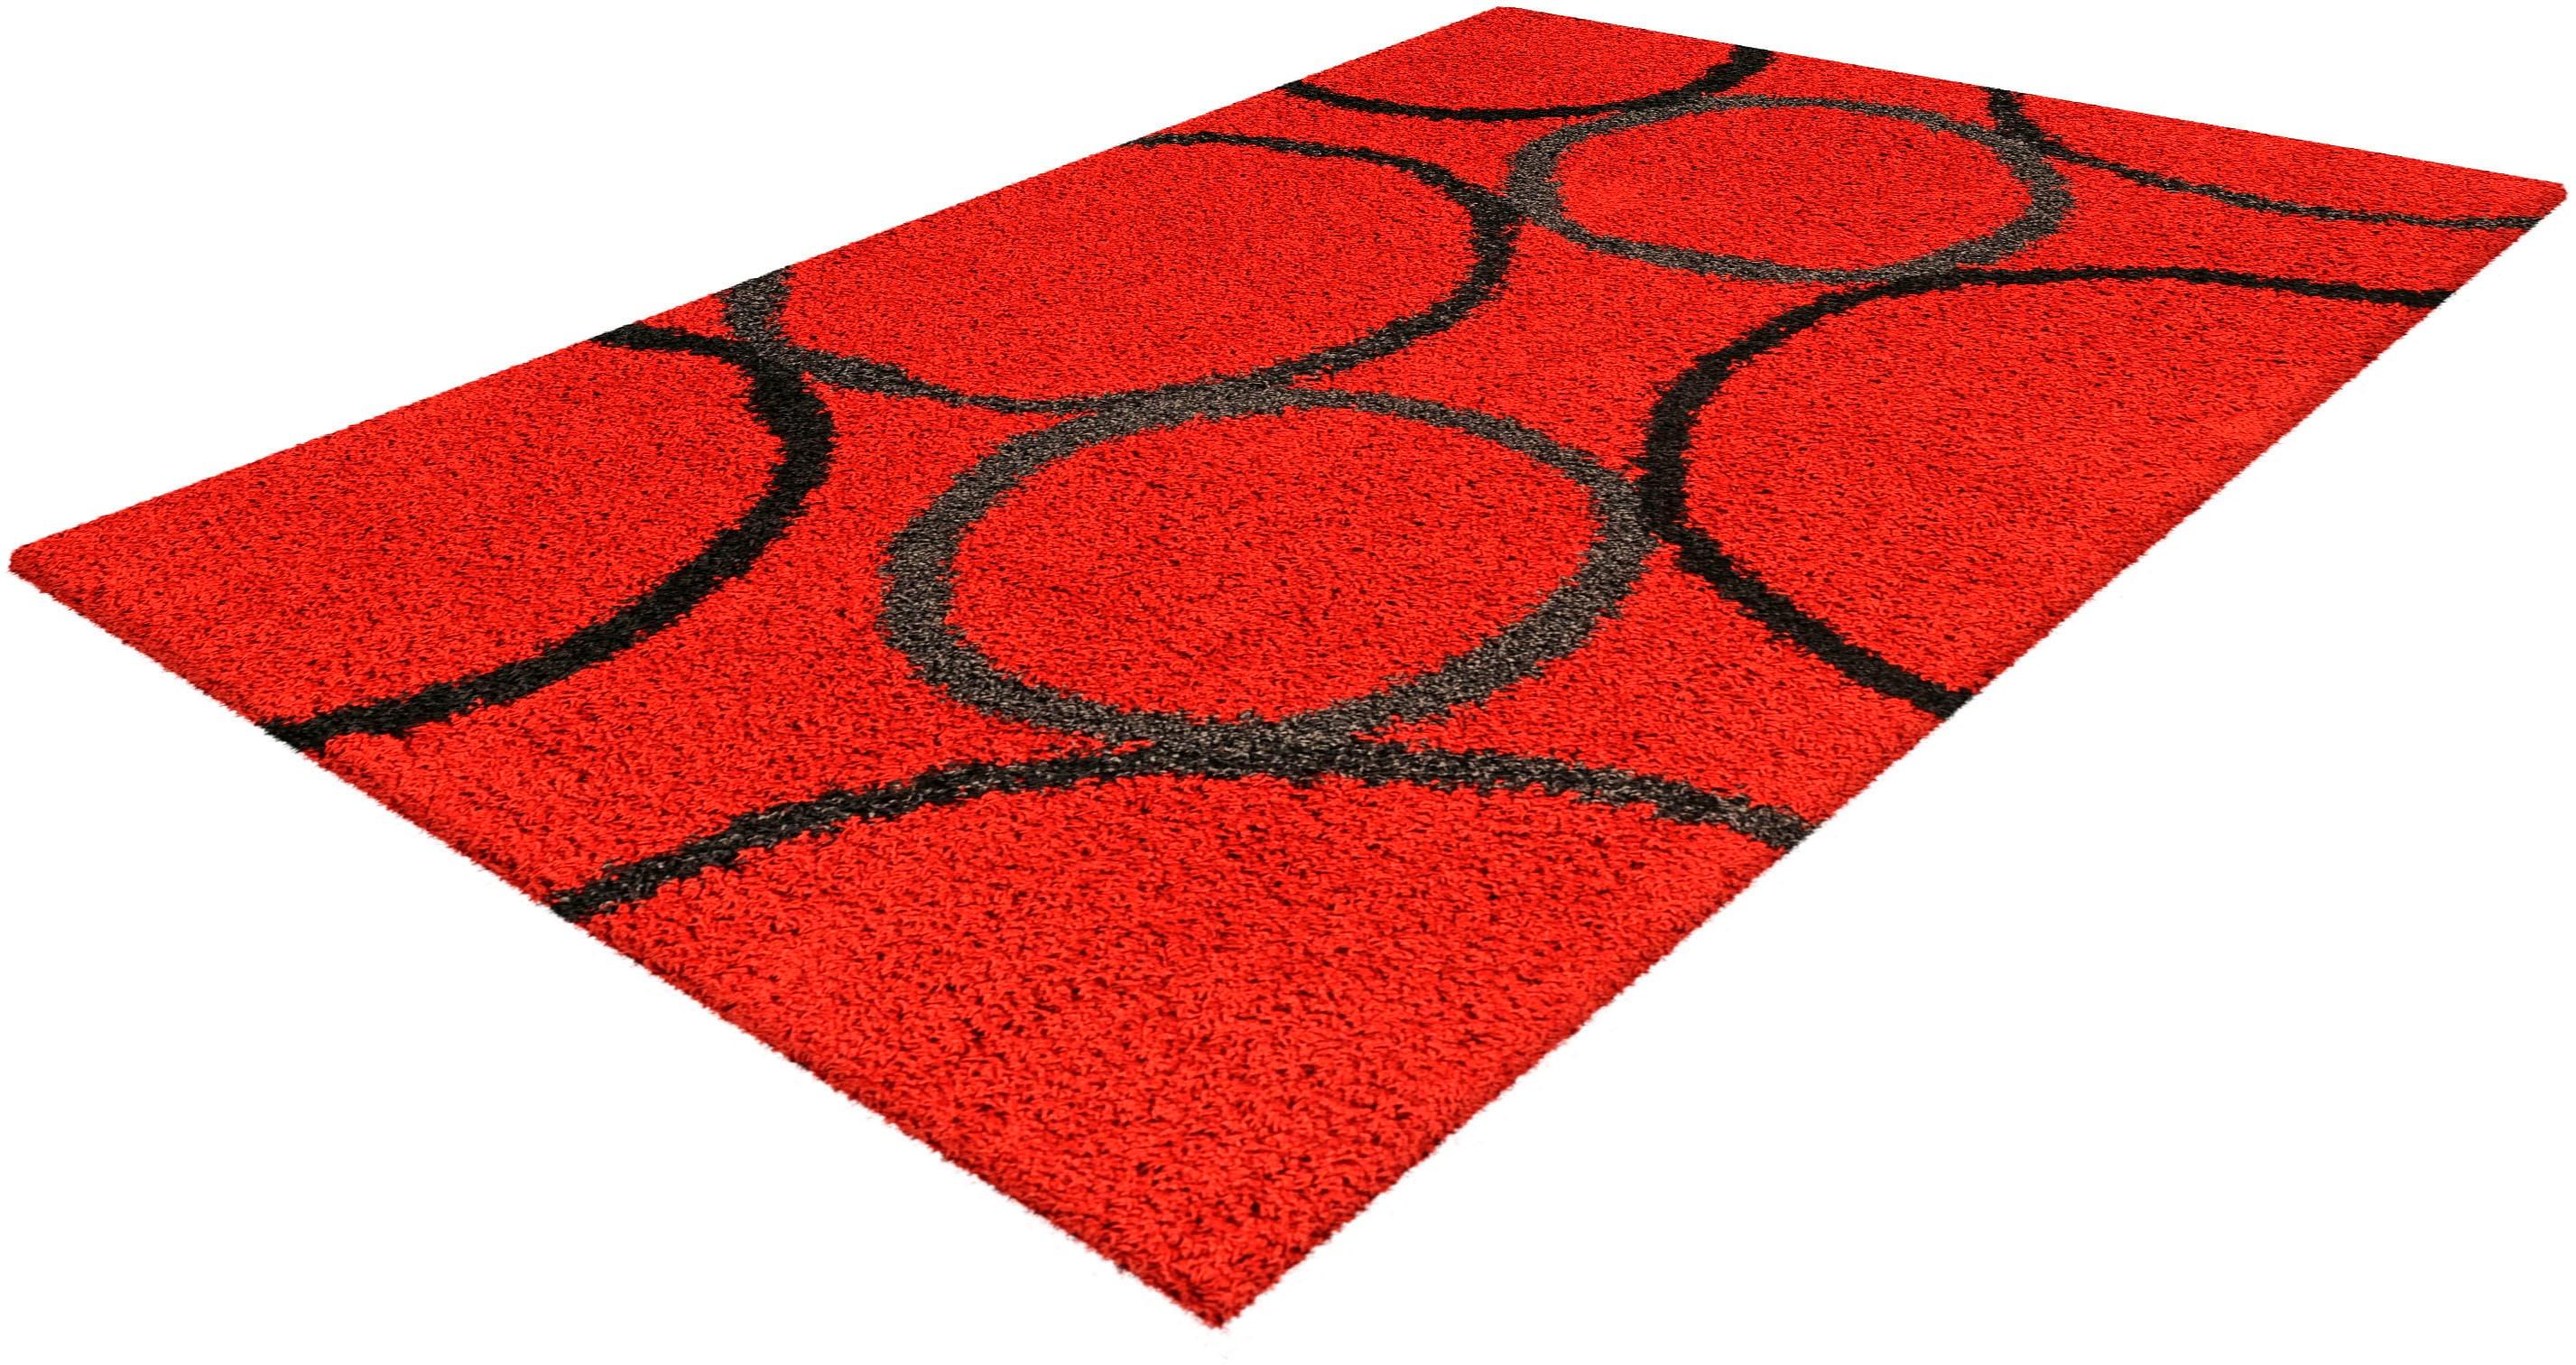 Hochflor-Teppich Maedow 4004 Arte Espina rechteckig Höhe 40 mm maschinell gewebt